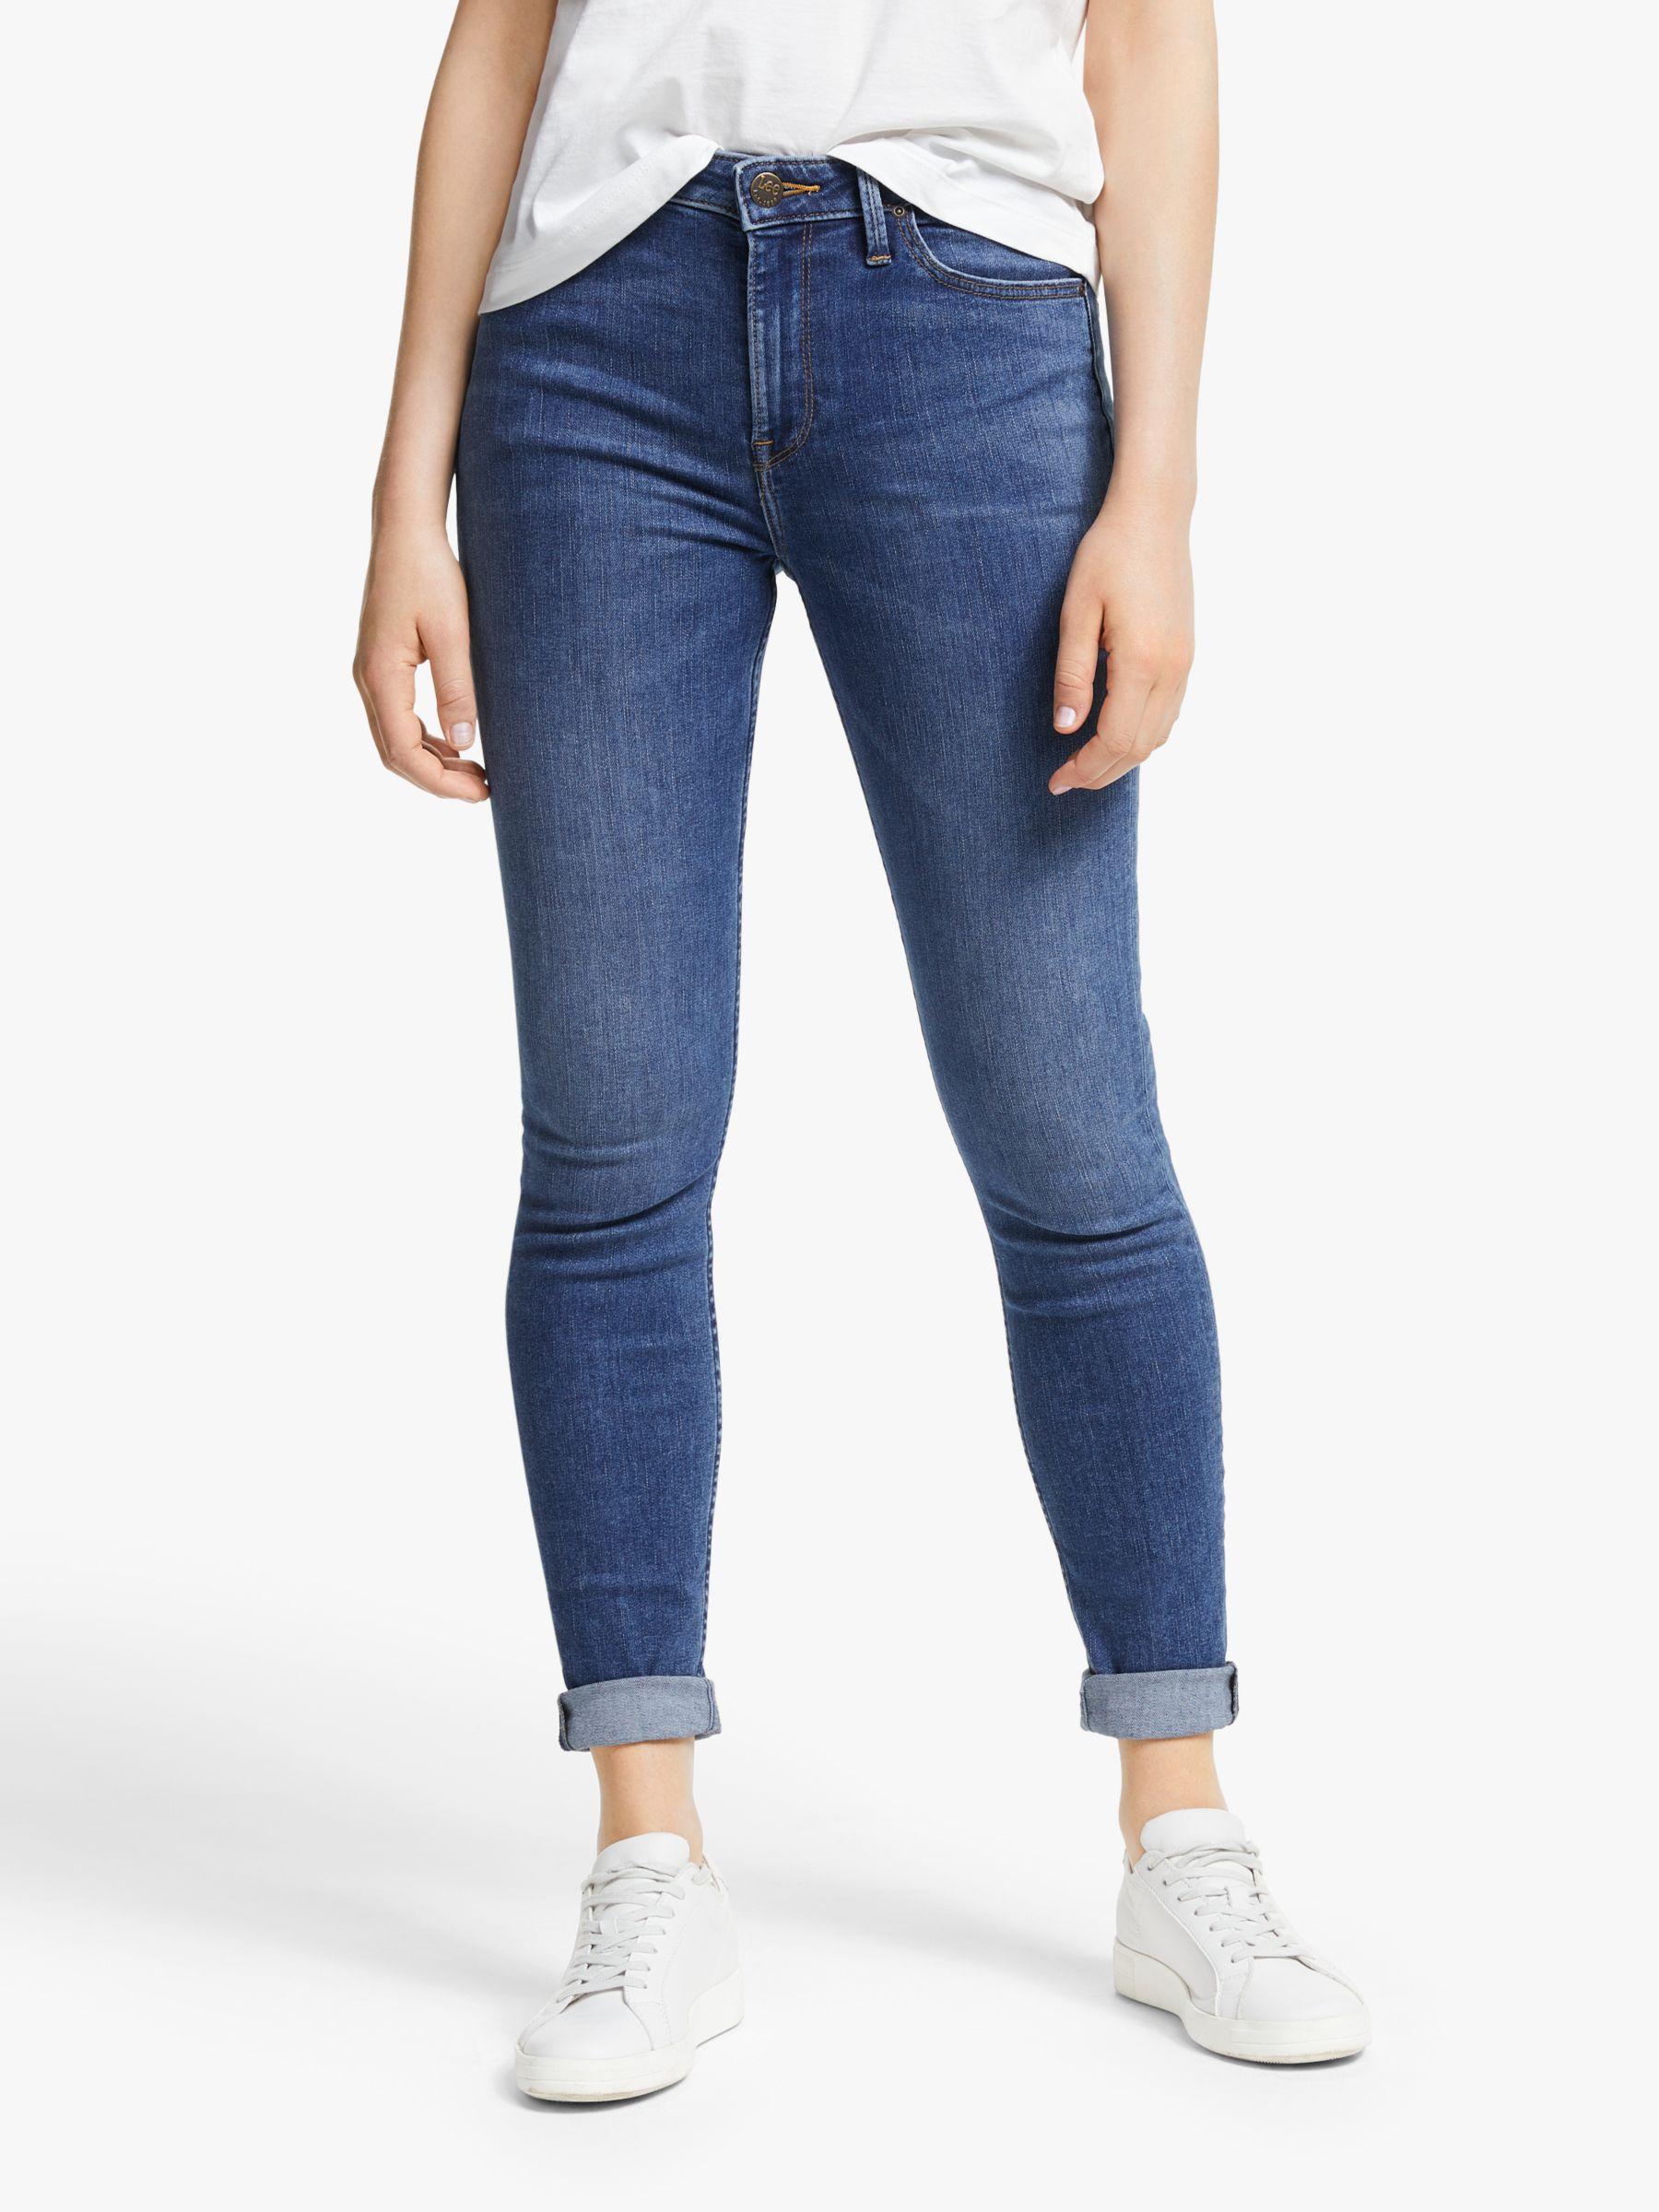 Lee Lee Scarlett High Waist Skinny Jeans, Mid Copan